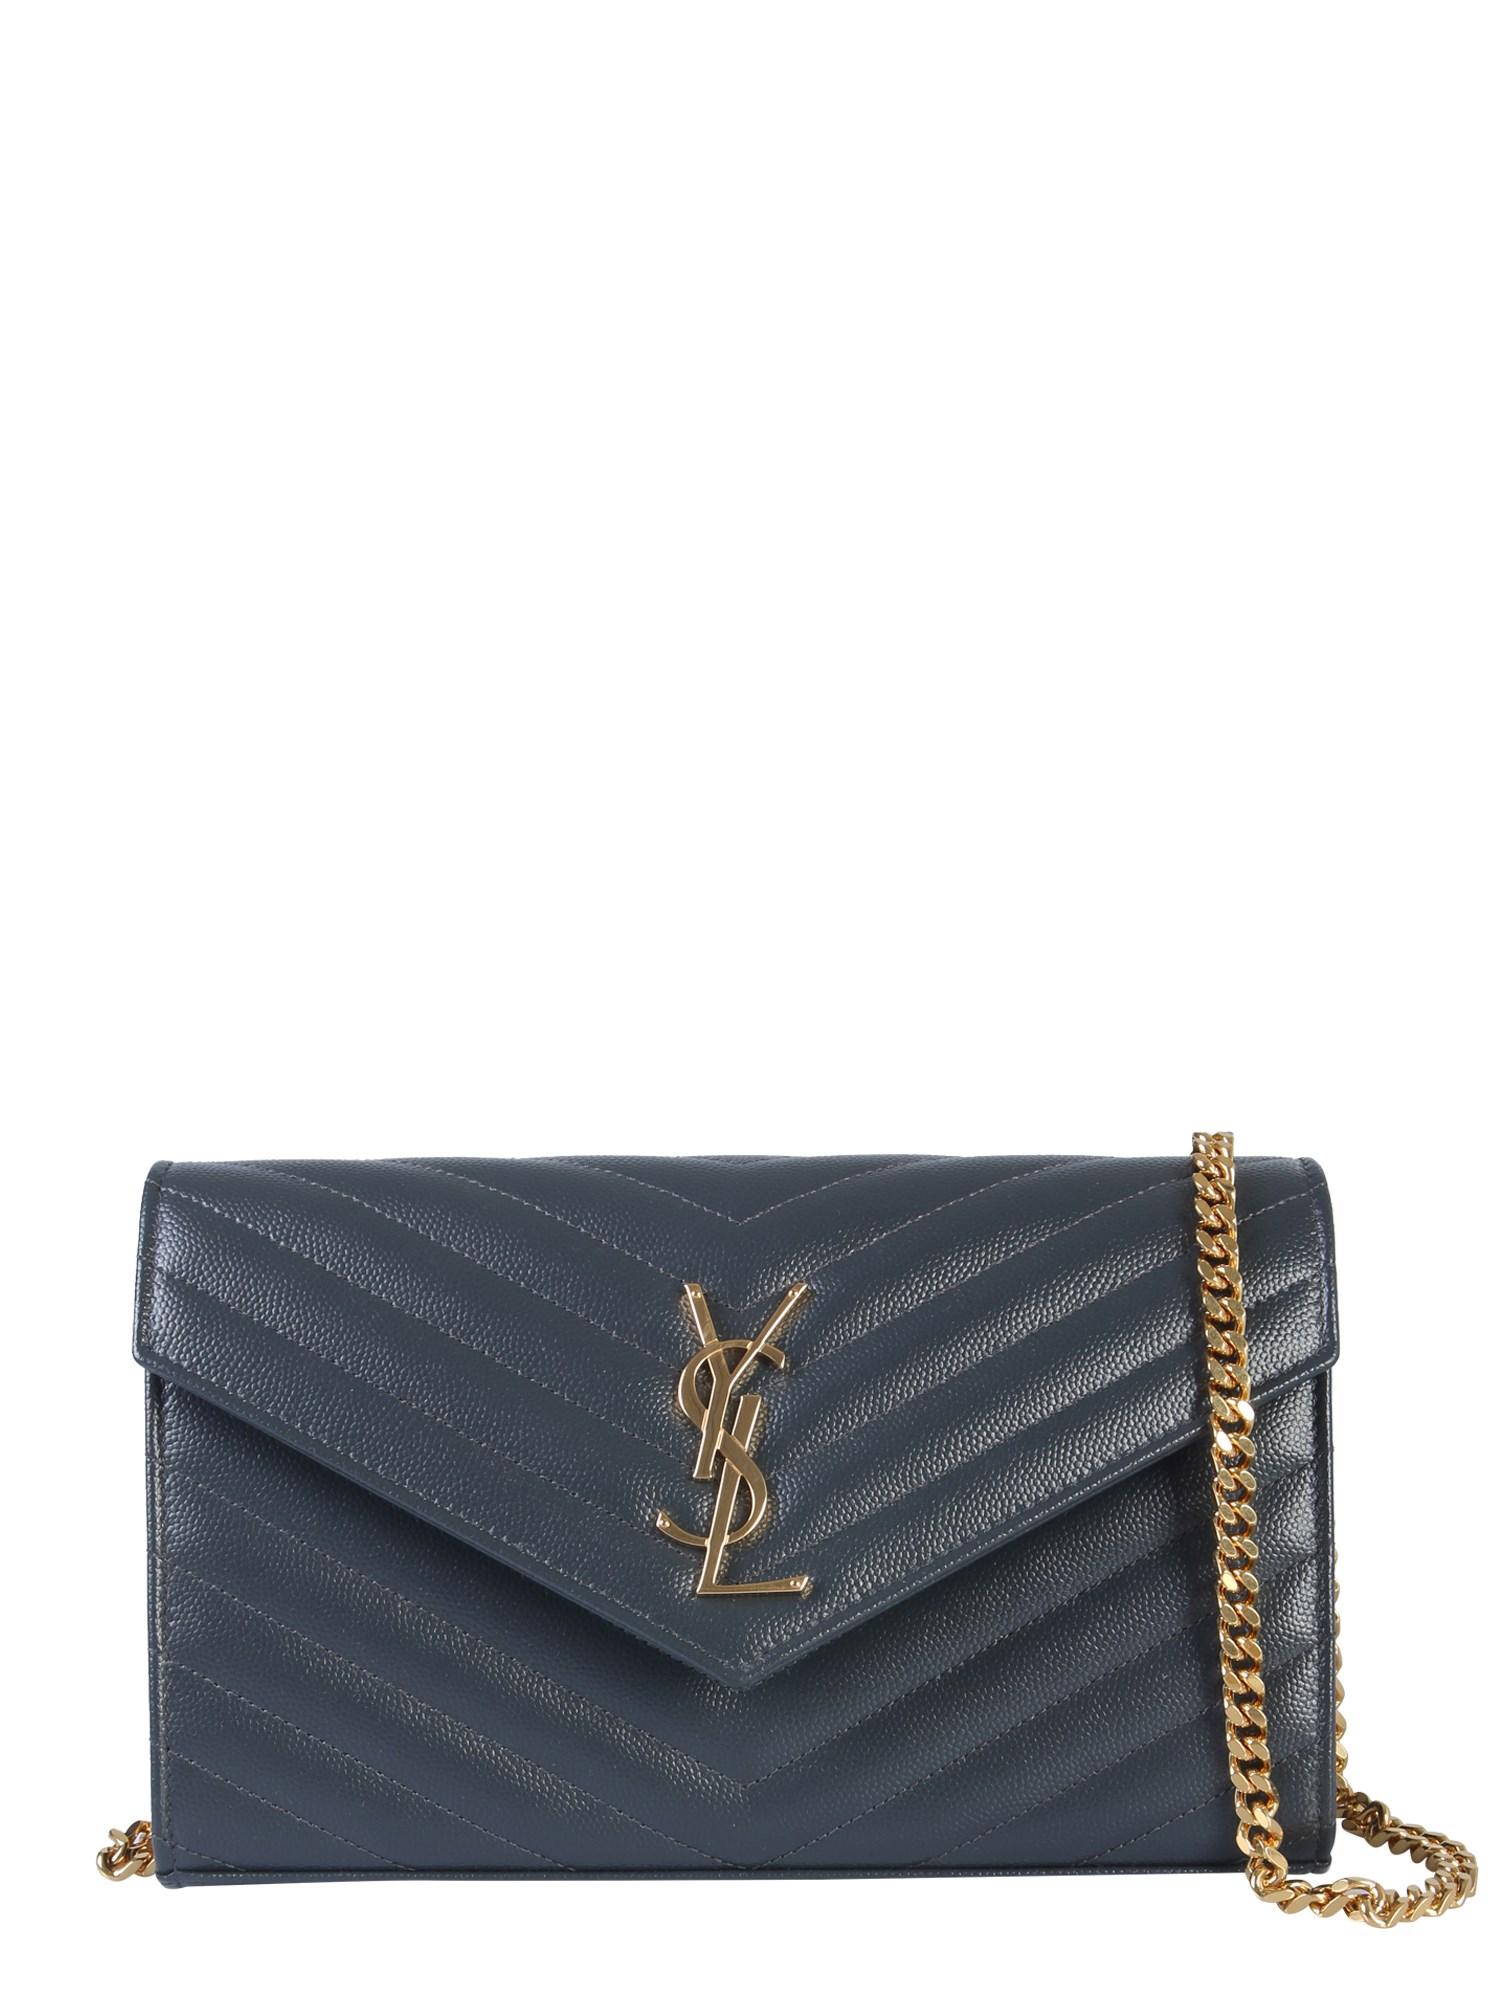 Bolsa Mini Monograma de pele Yves Saint Laurent